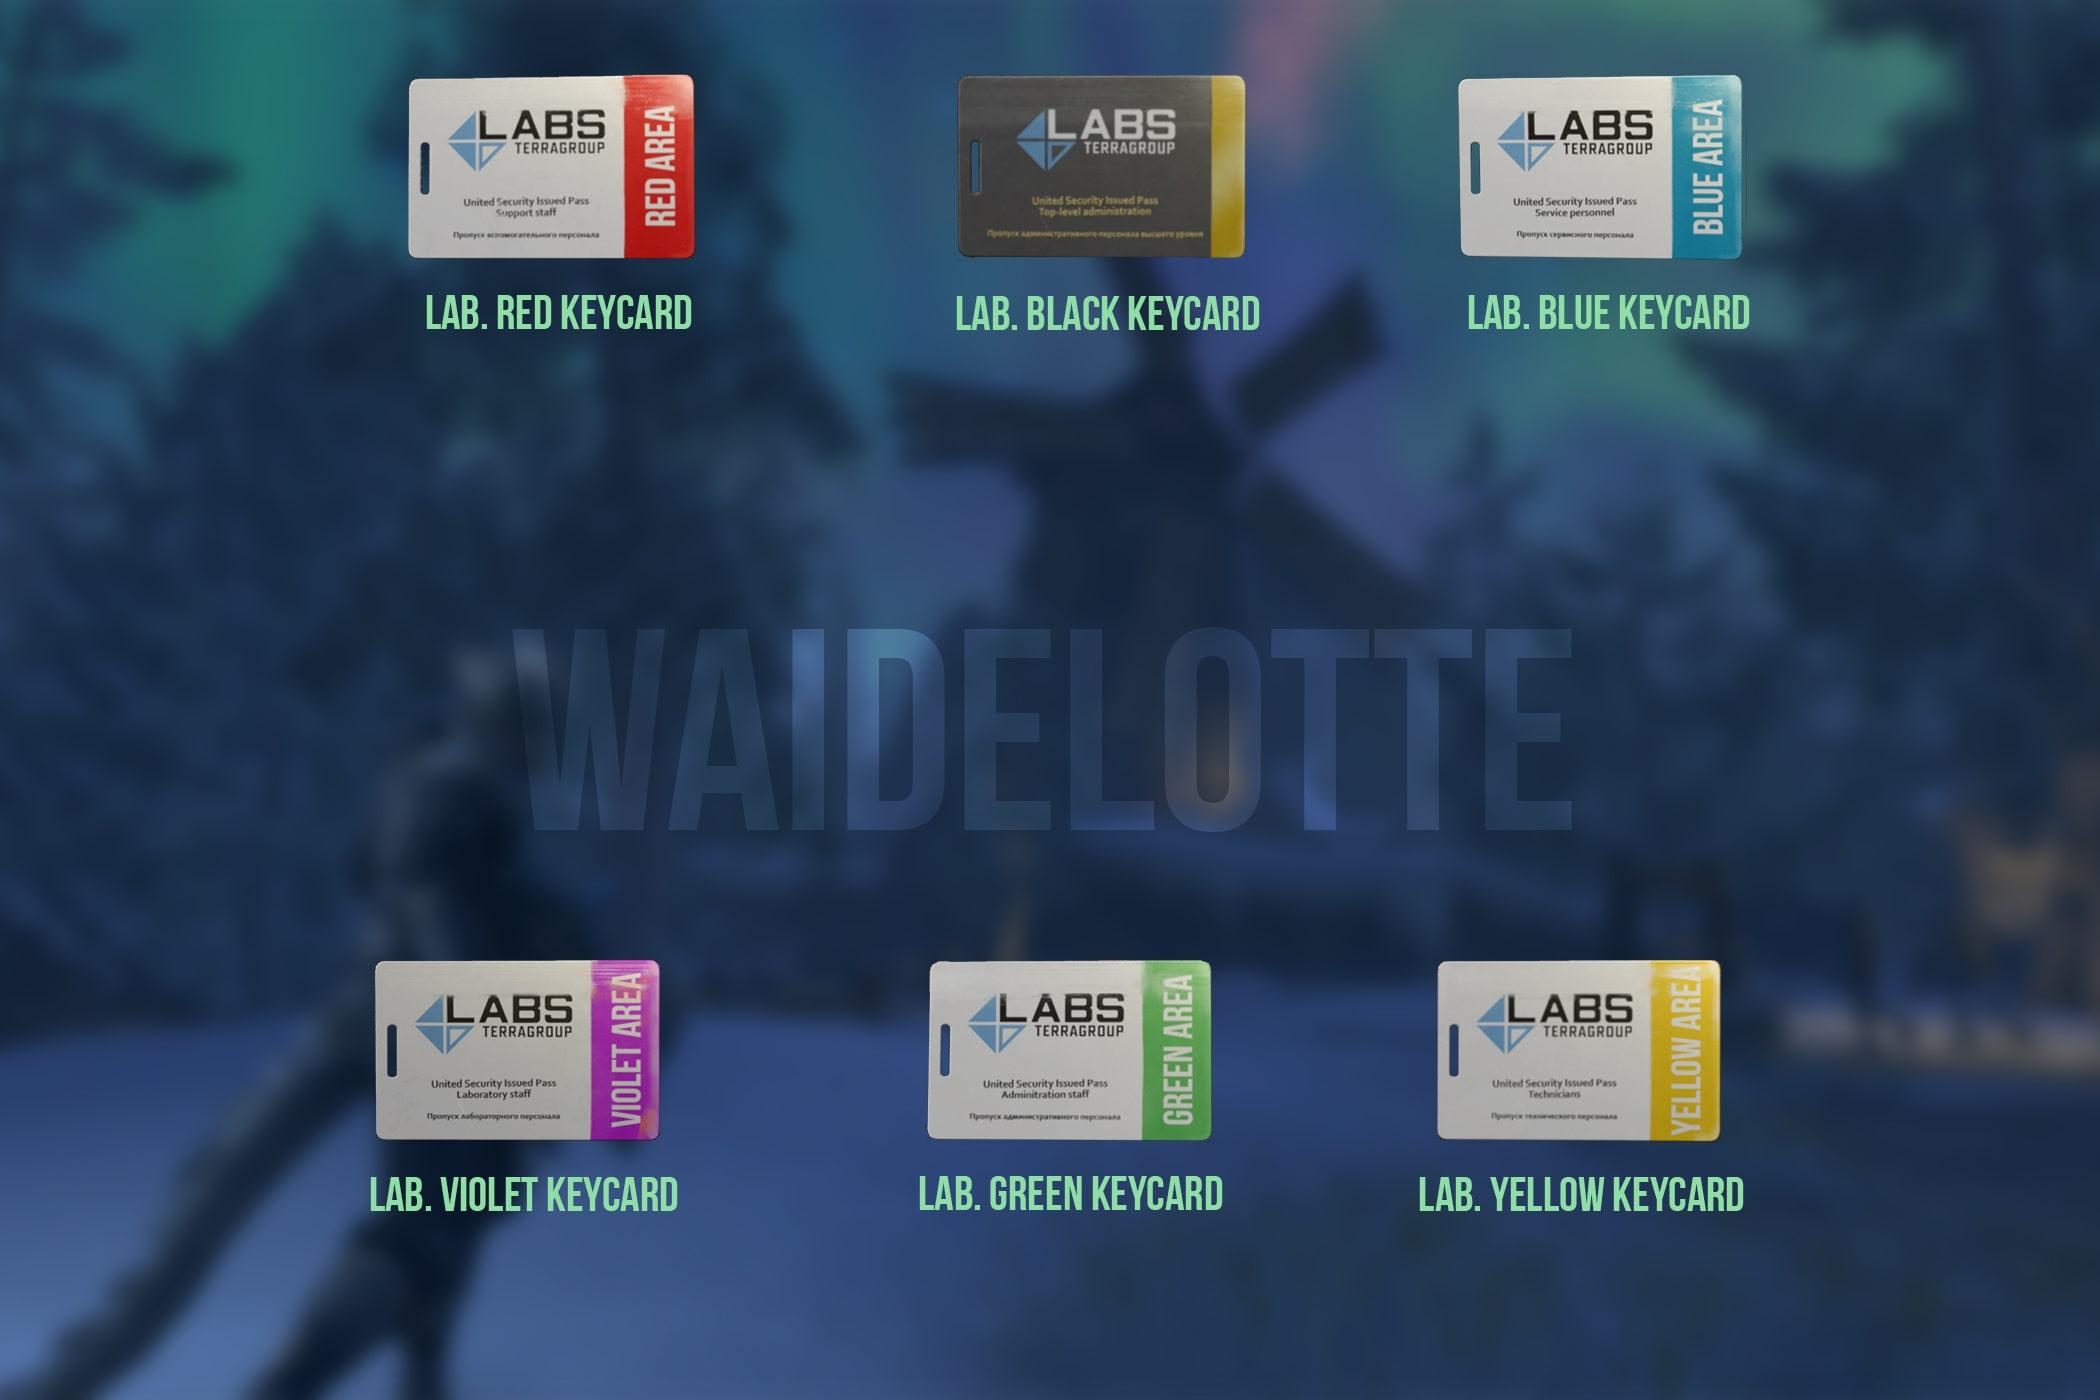 ⭐️ LAB set Lab. full keys set [3 keys + 6 keycards + docs] [Cheap and Fast delsivery]. 24/7 Instant